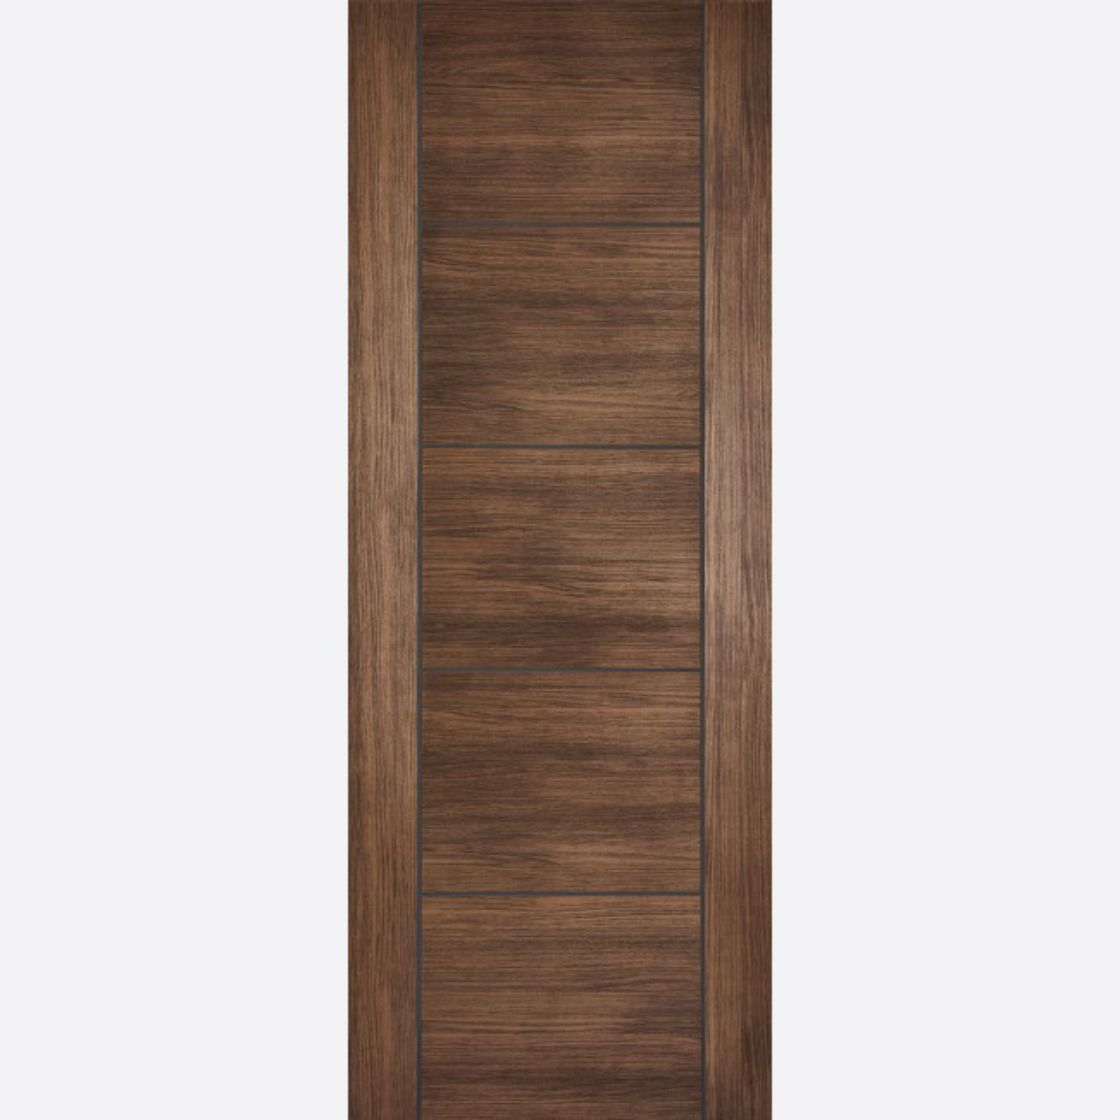 Vancouver Door Flush *Pre-Finished Walnut Laminate* 35mm Internal - LPD Laminate Doors & Vancouver Walnut Laminate Internal Door